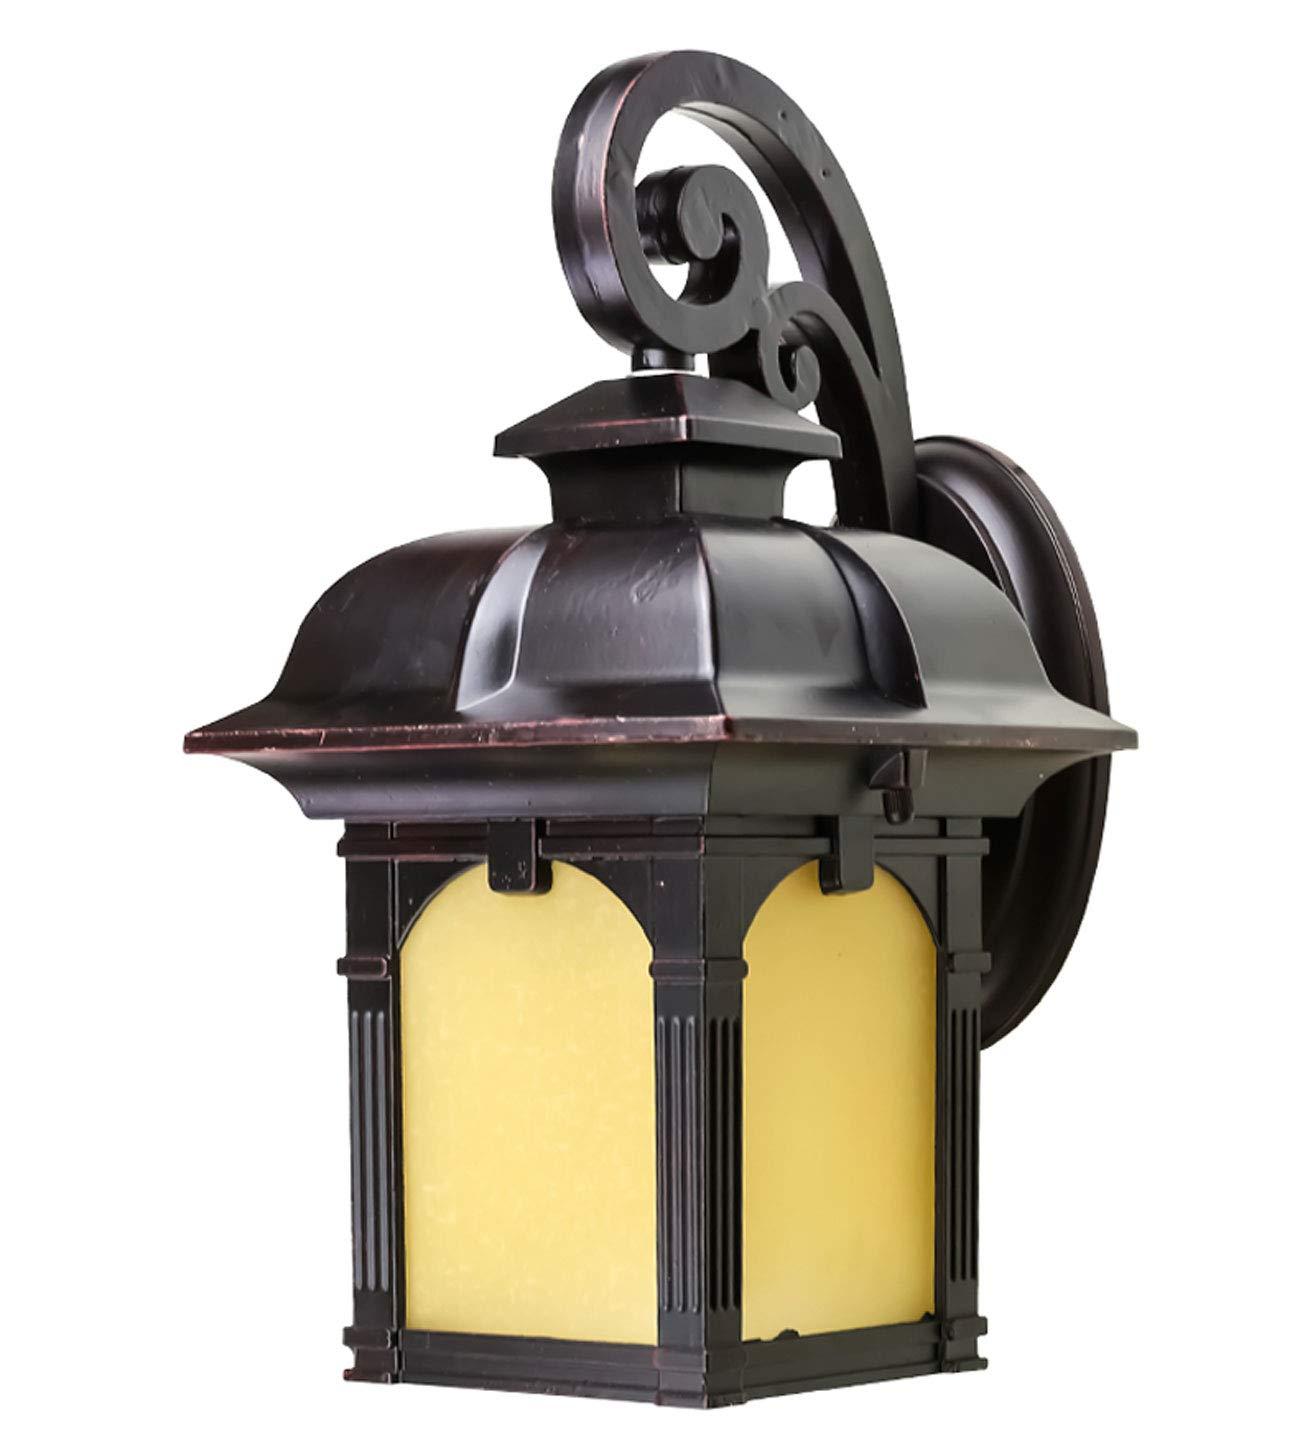 Lampada da testa europea colonna lampada da parete europea lampada da parete piazza esterna porta lampada pilastro lampada balcone antico lampada esterna LED lampada a sospensione villa lampada format